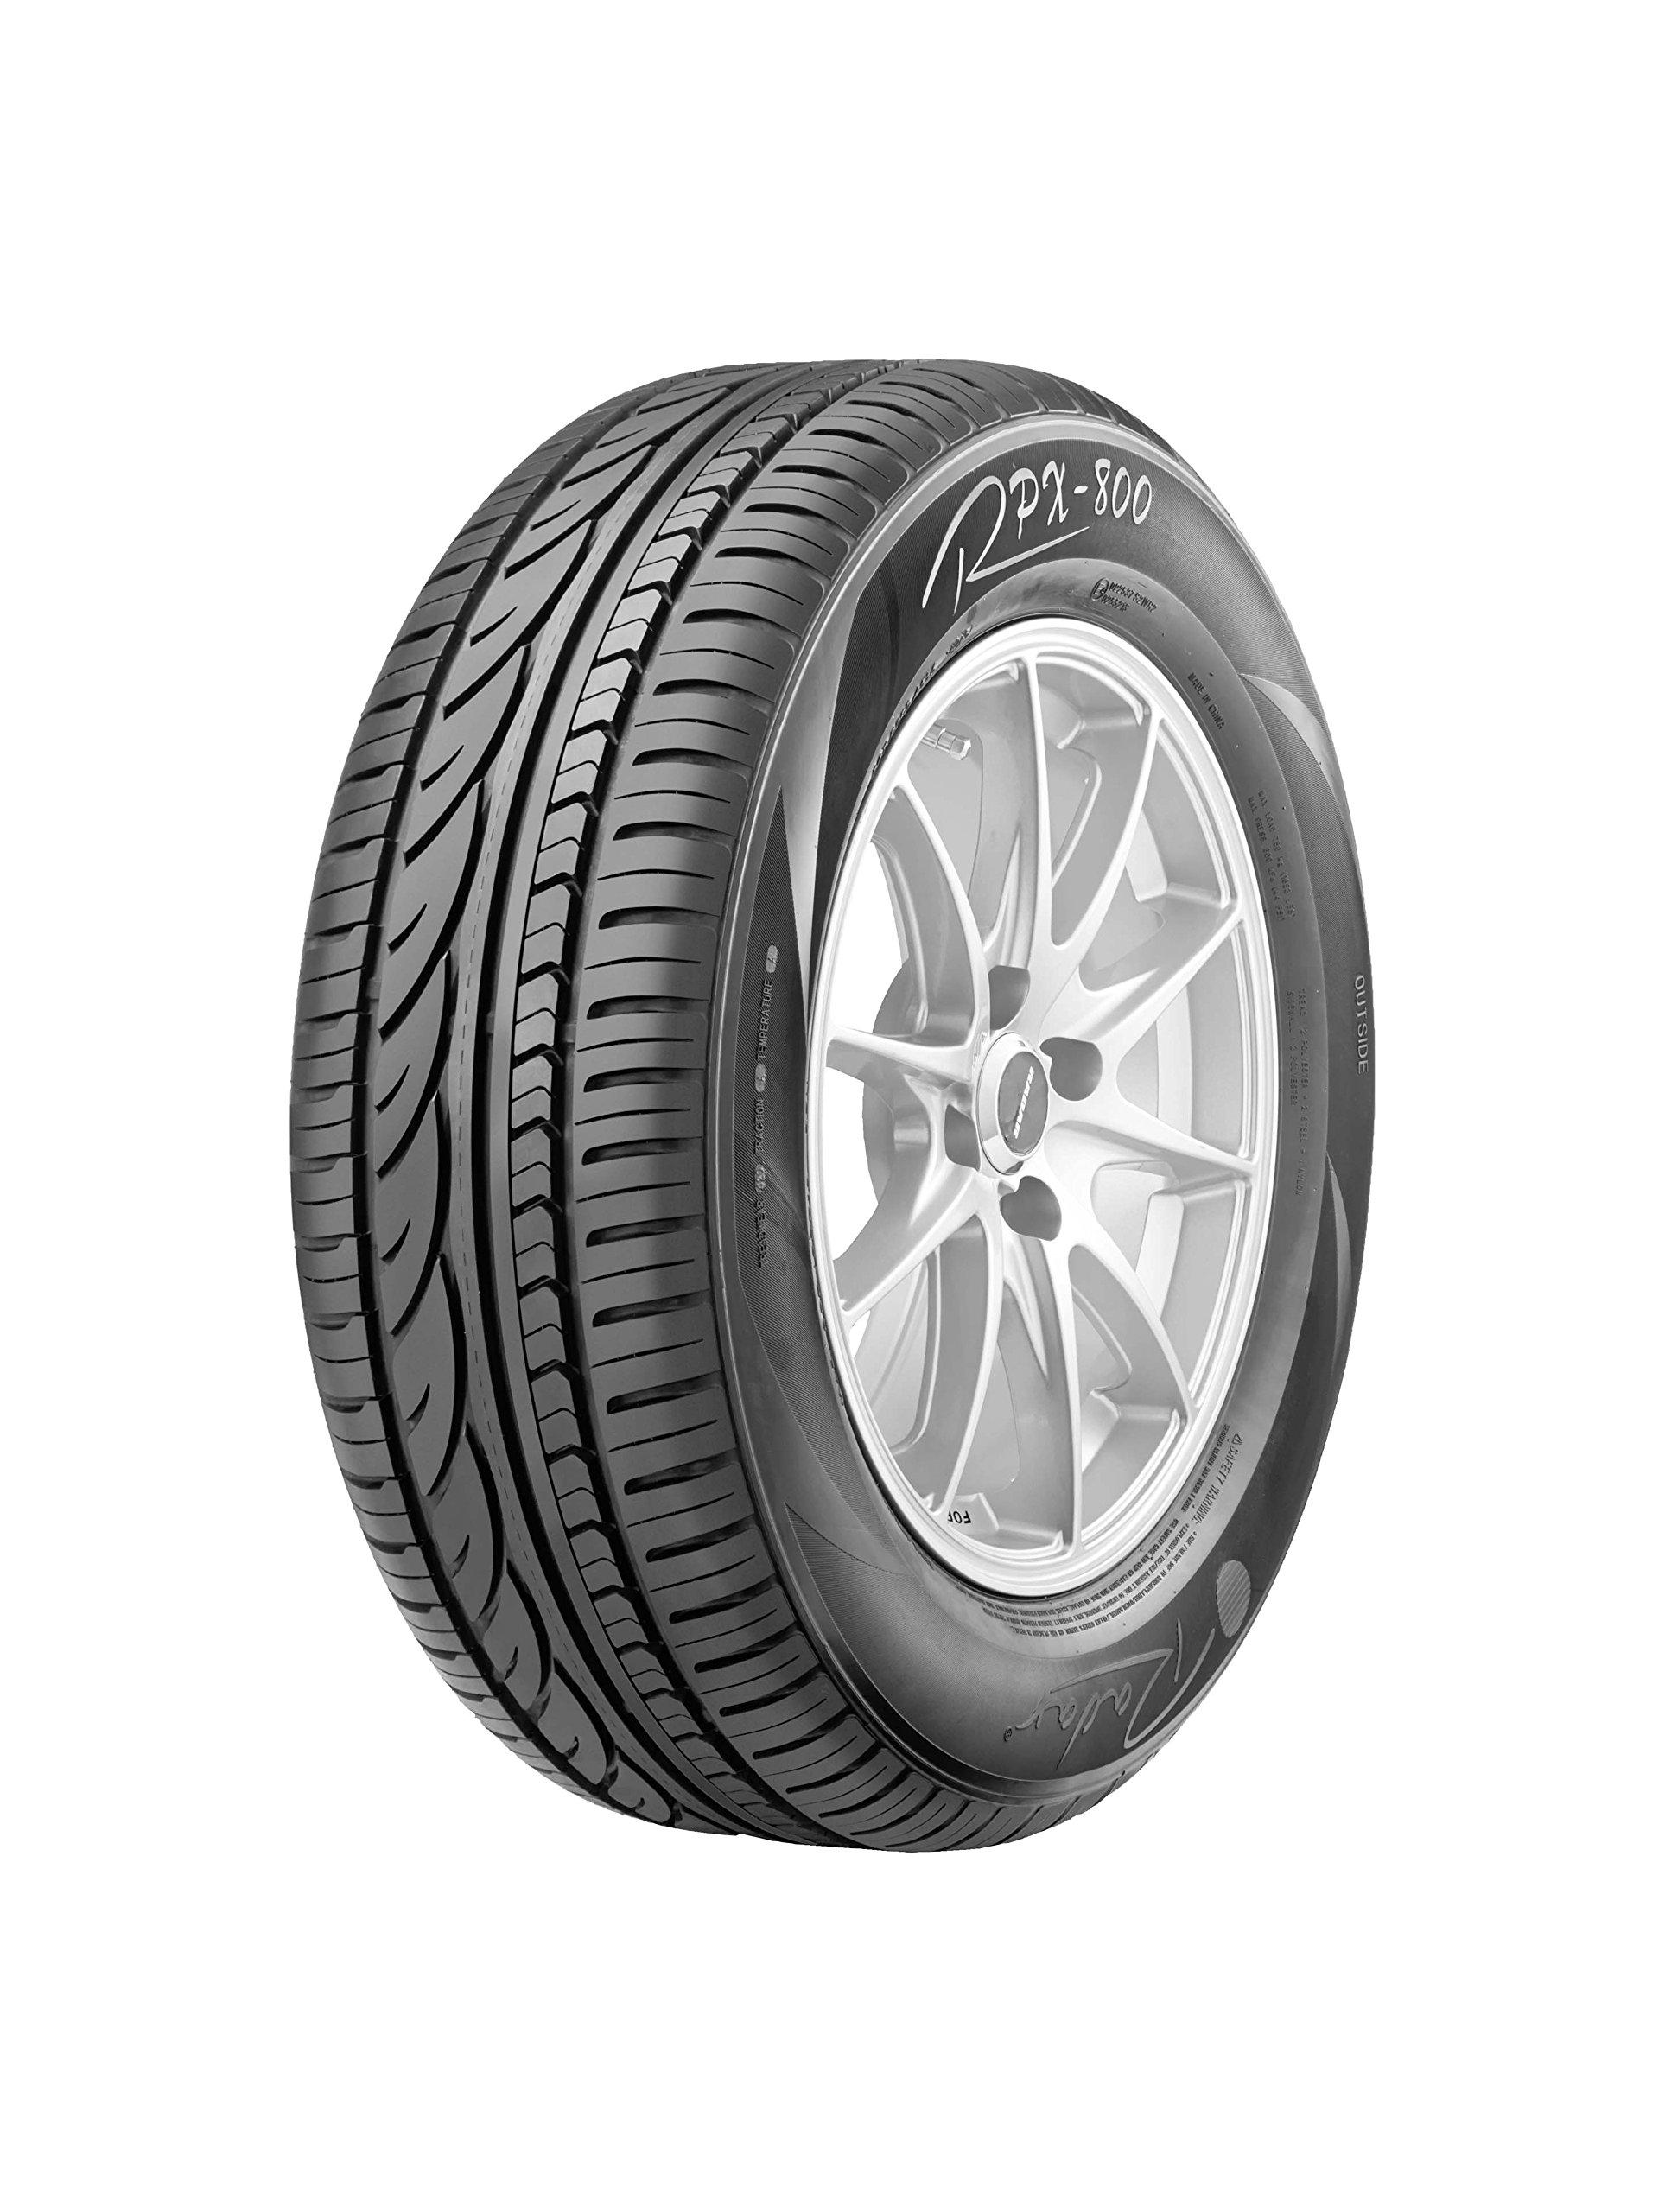 Radar Tires RPX 800 Touring Radial Tire - 155/60R15 74V